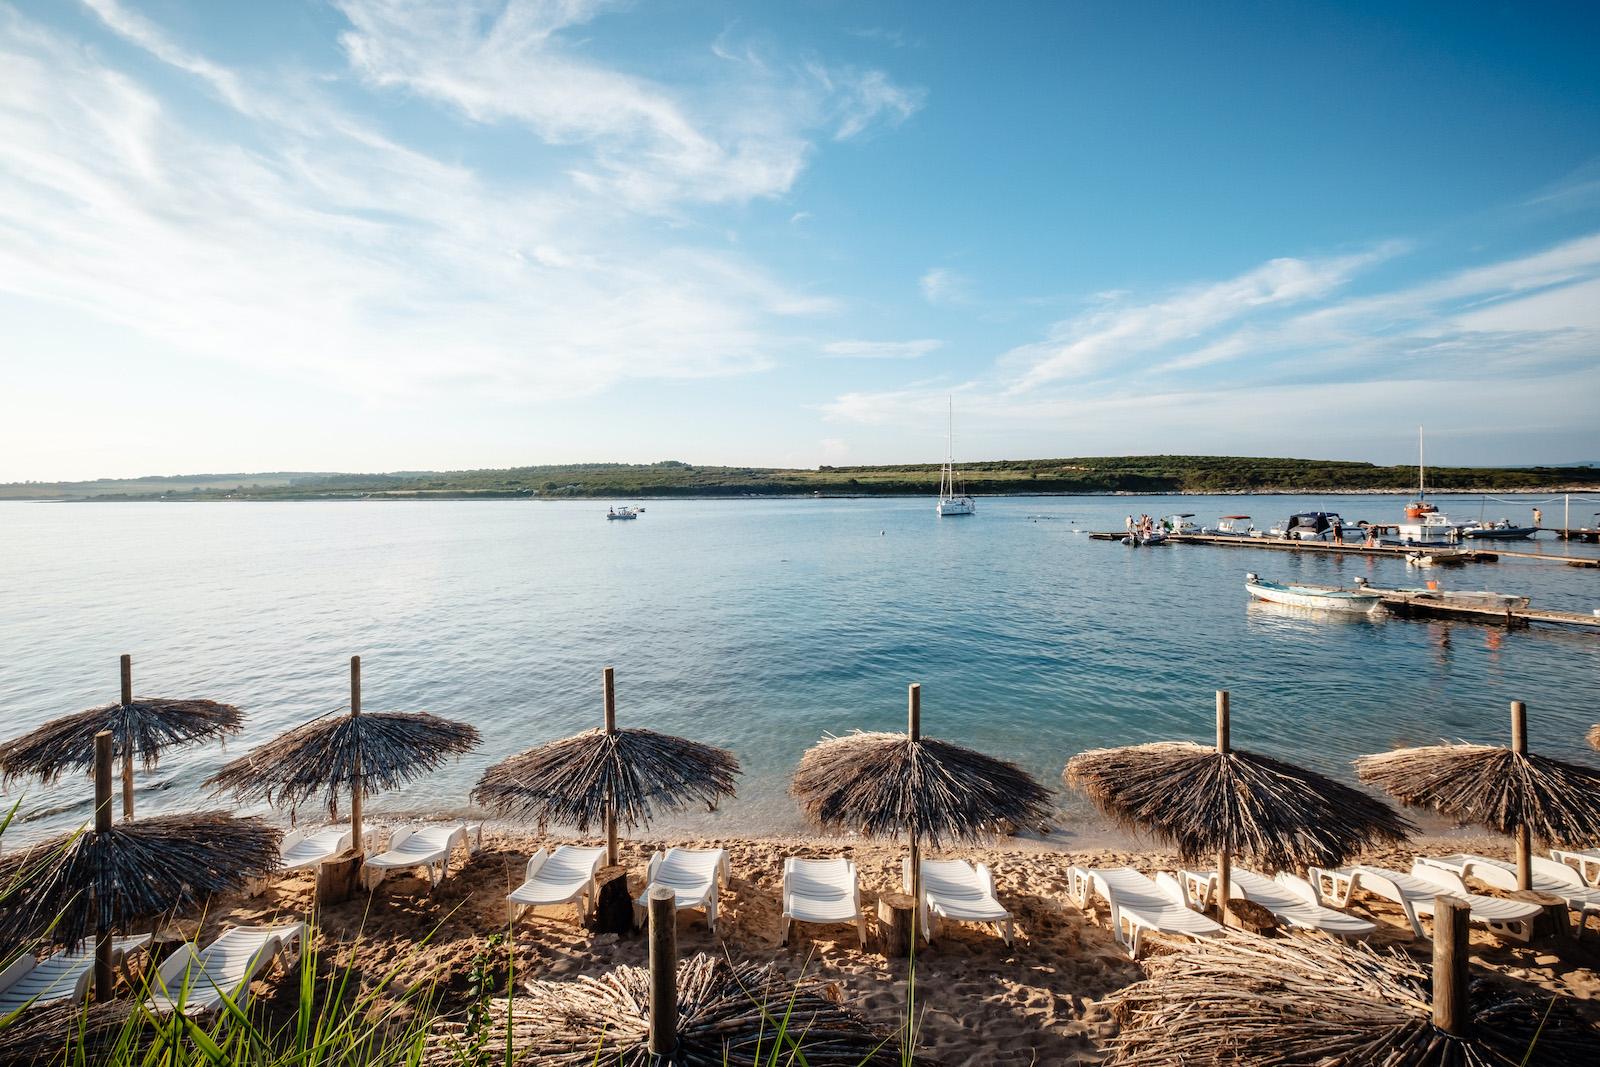 hochzeitsplanung- kroatien-beach-club-croatia-love